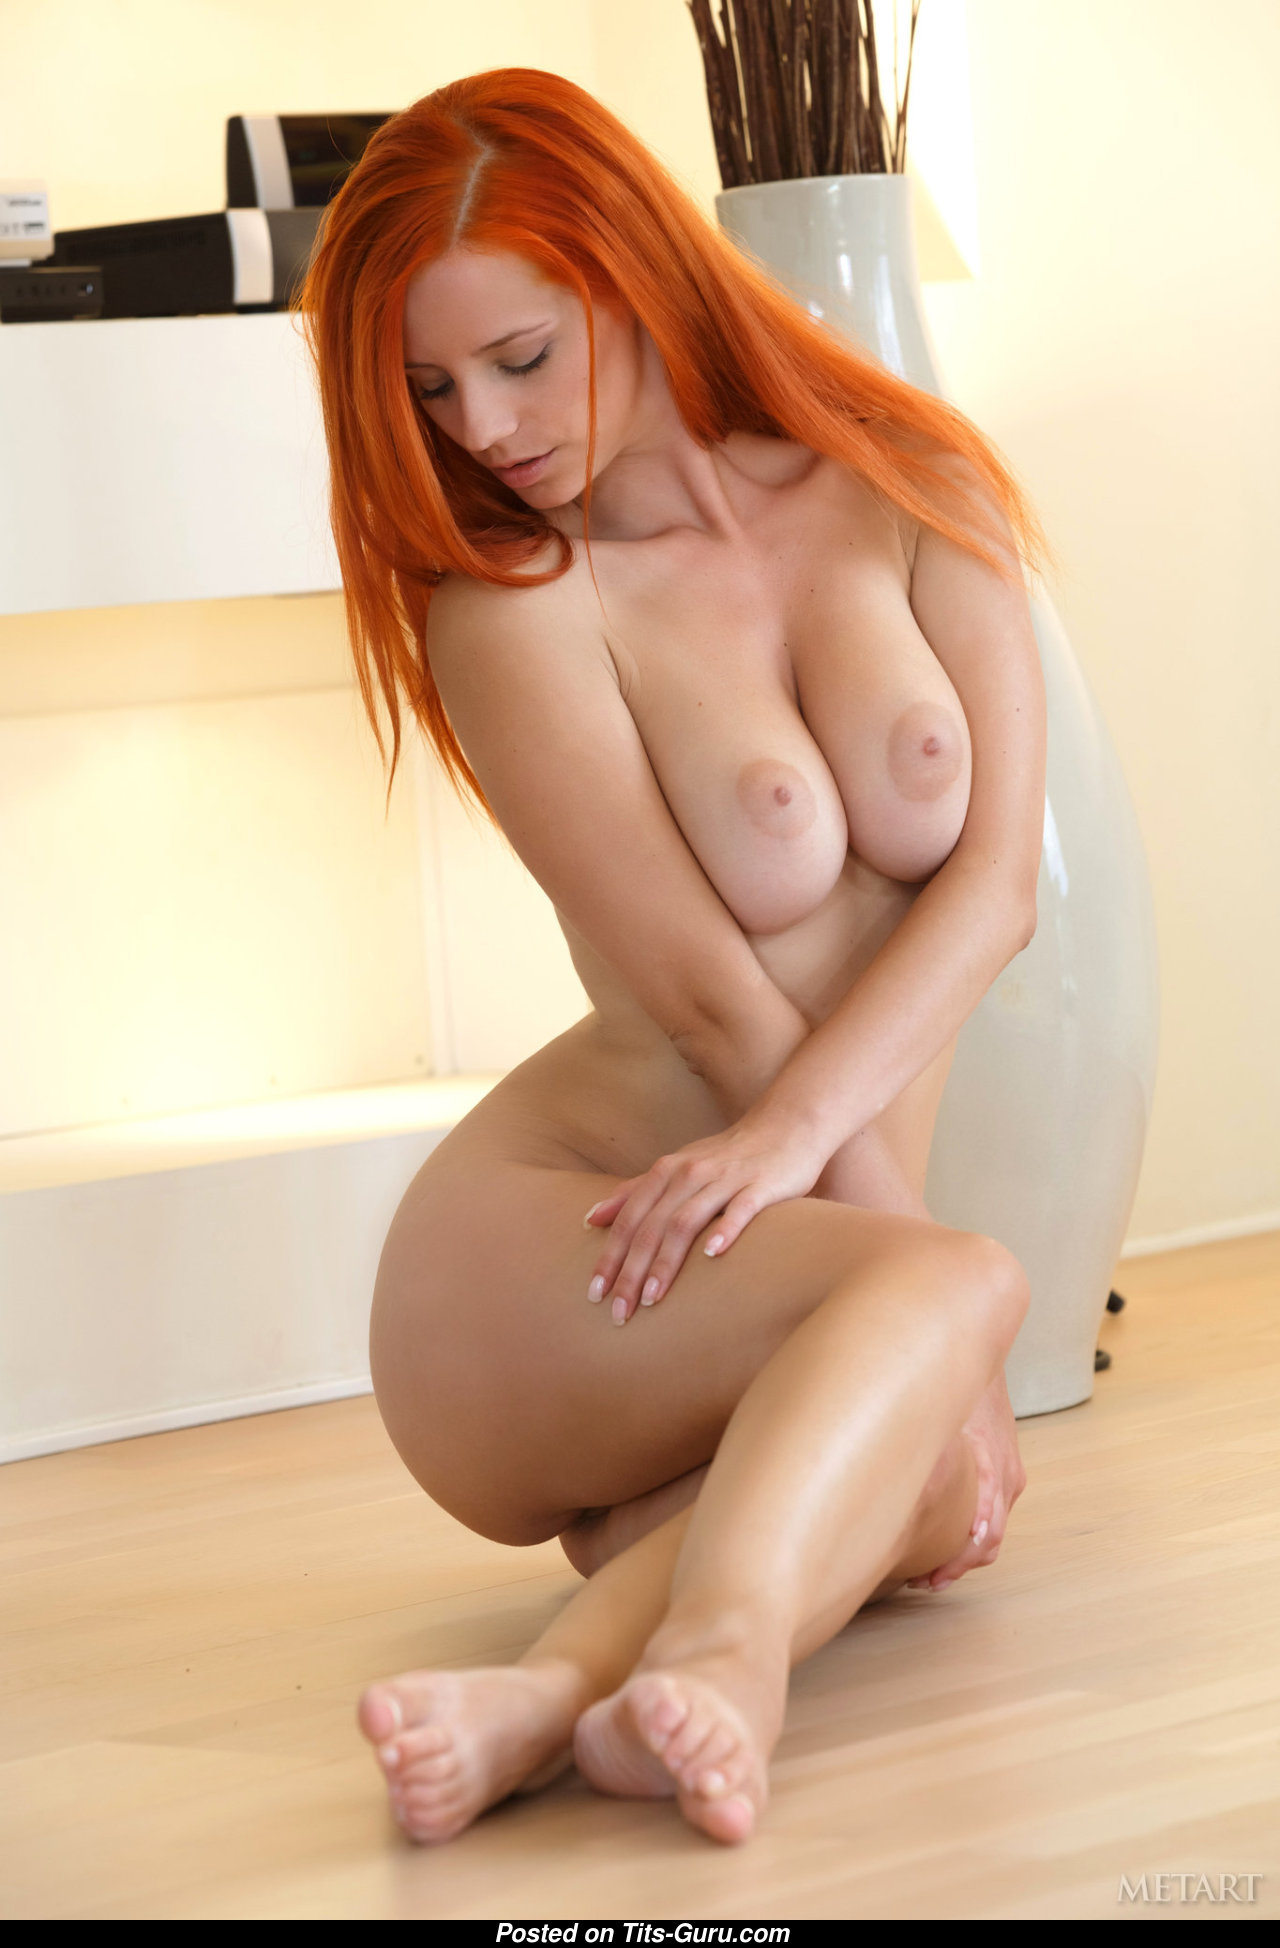 Horny big tits redhead babe